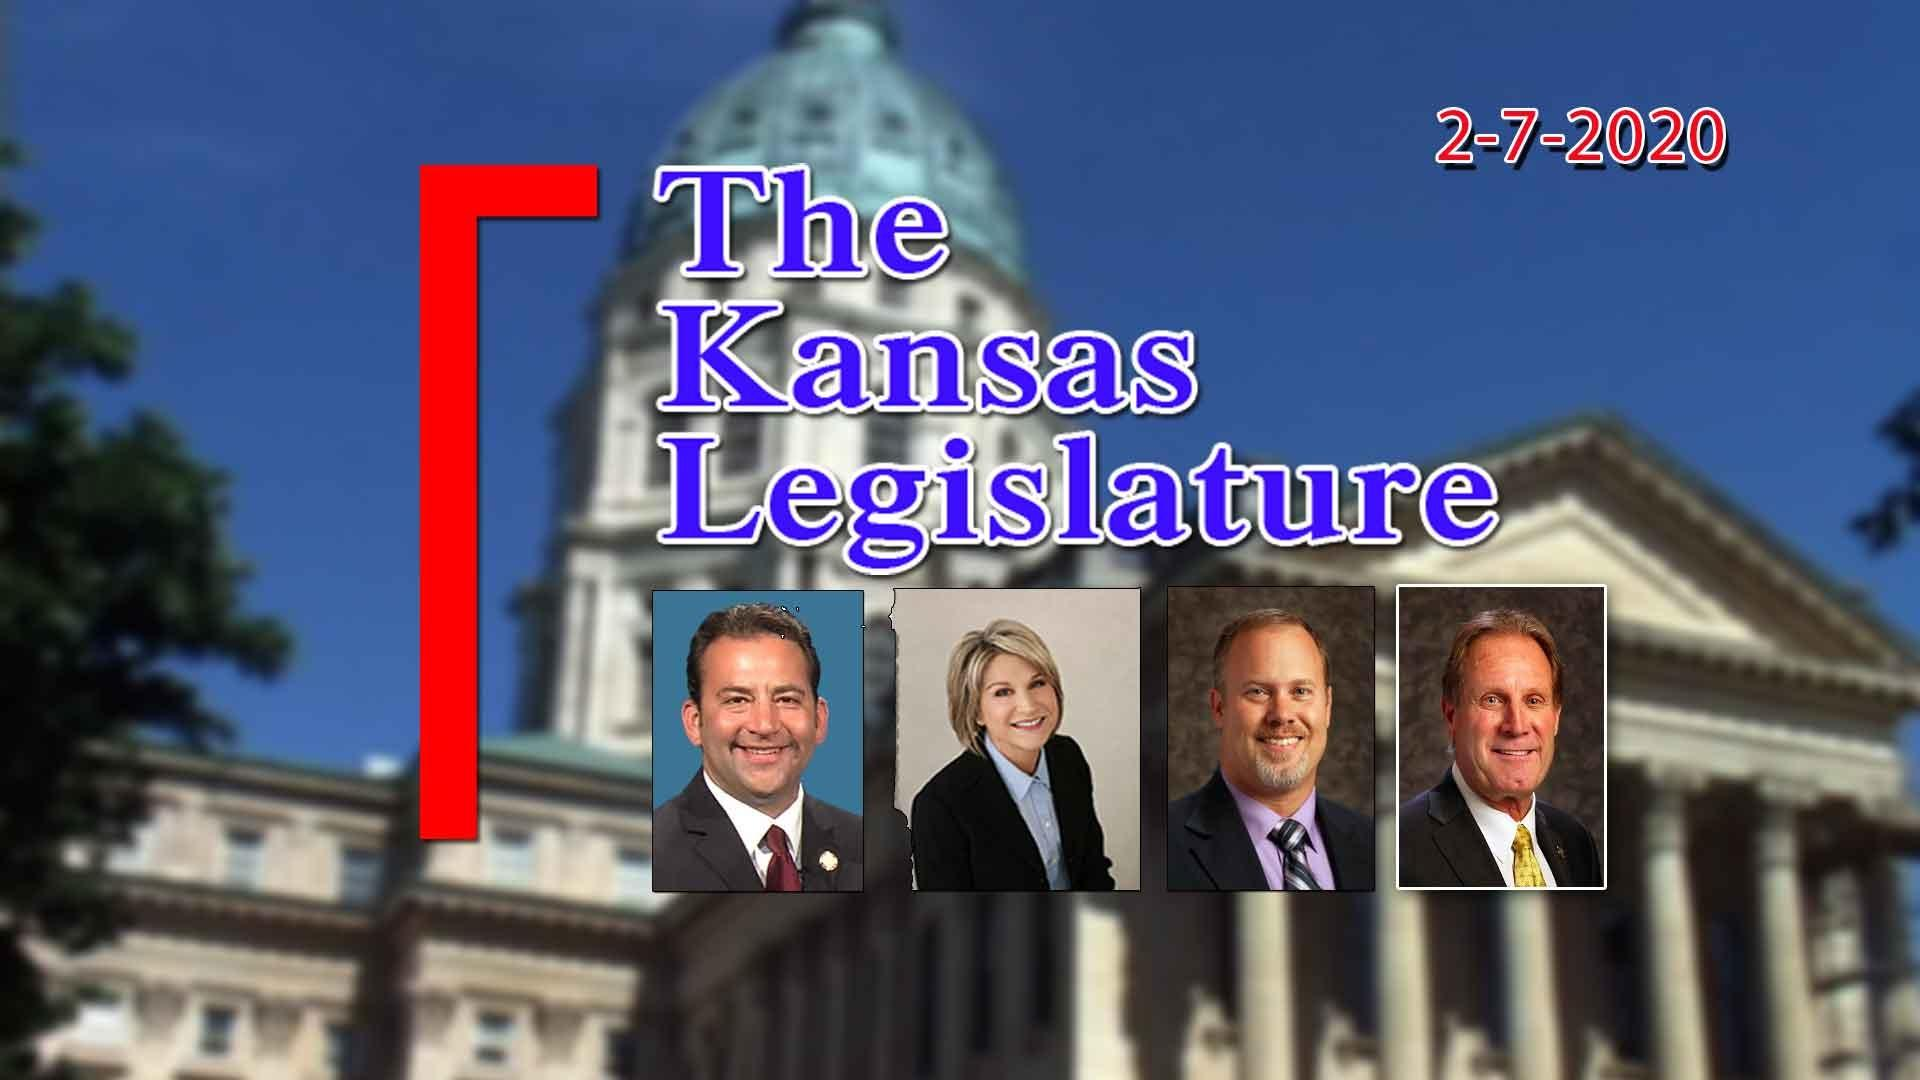 Kansas Legislature 2-7-2020